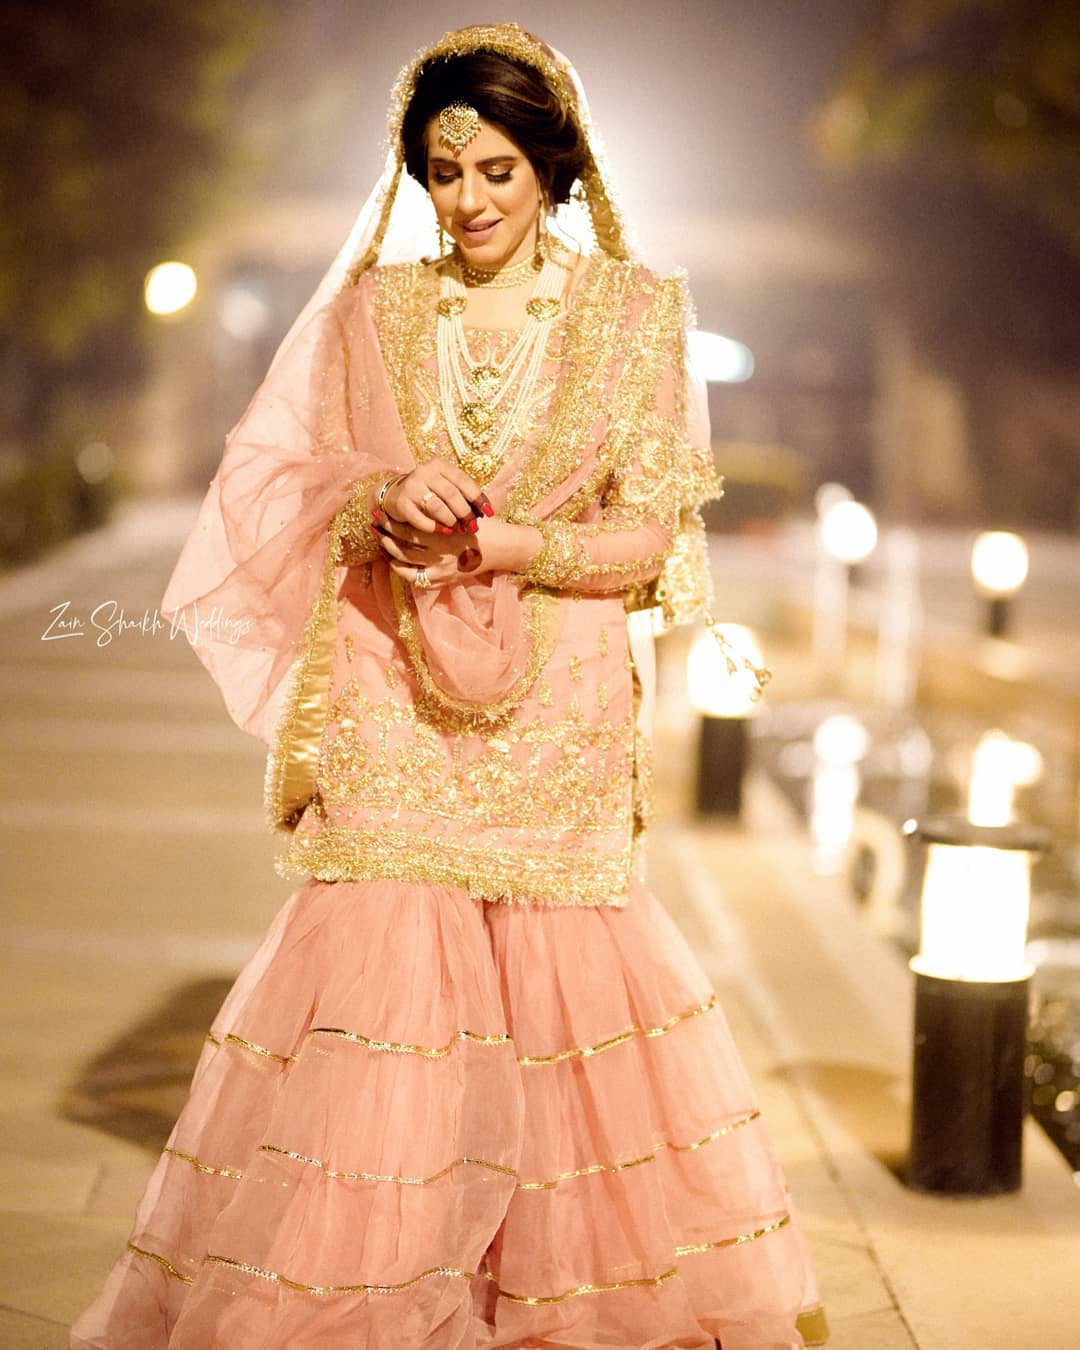 Singer Wali Hamid Ali Khan HD Wedding Pictures